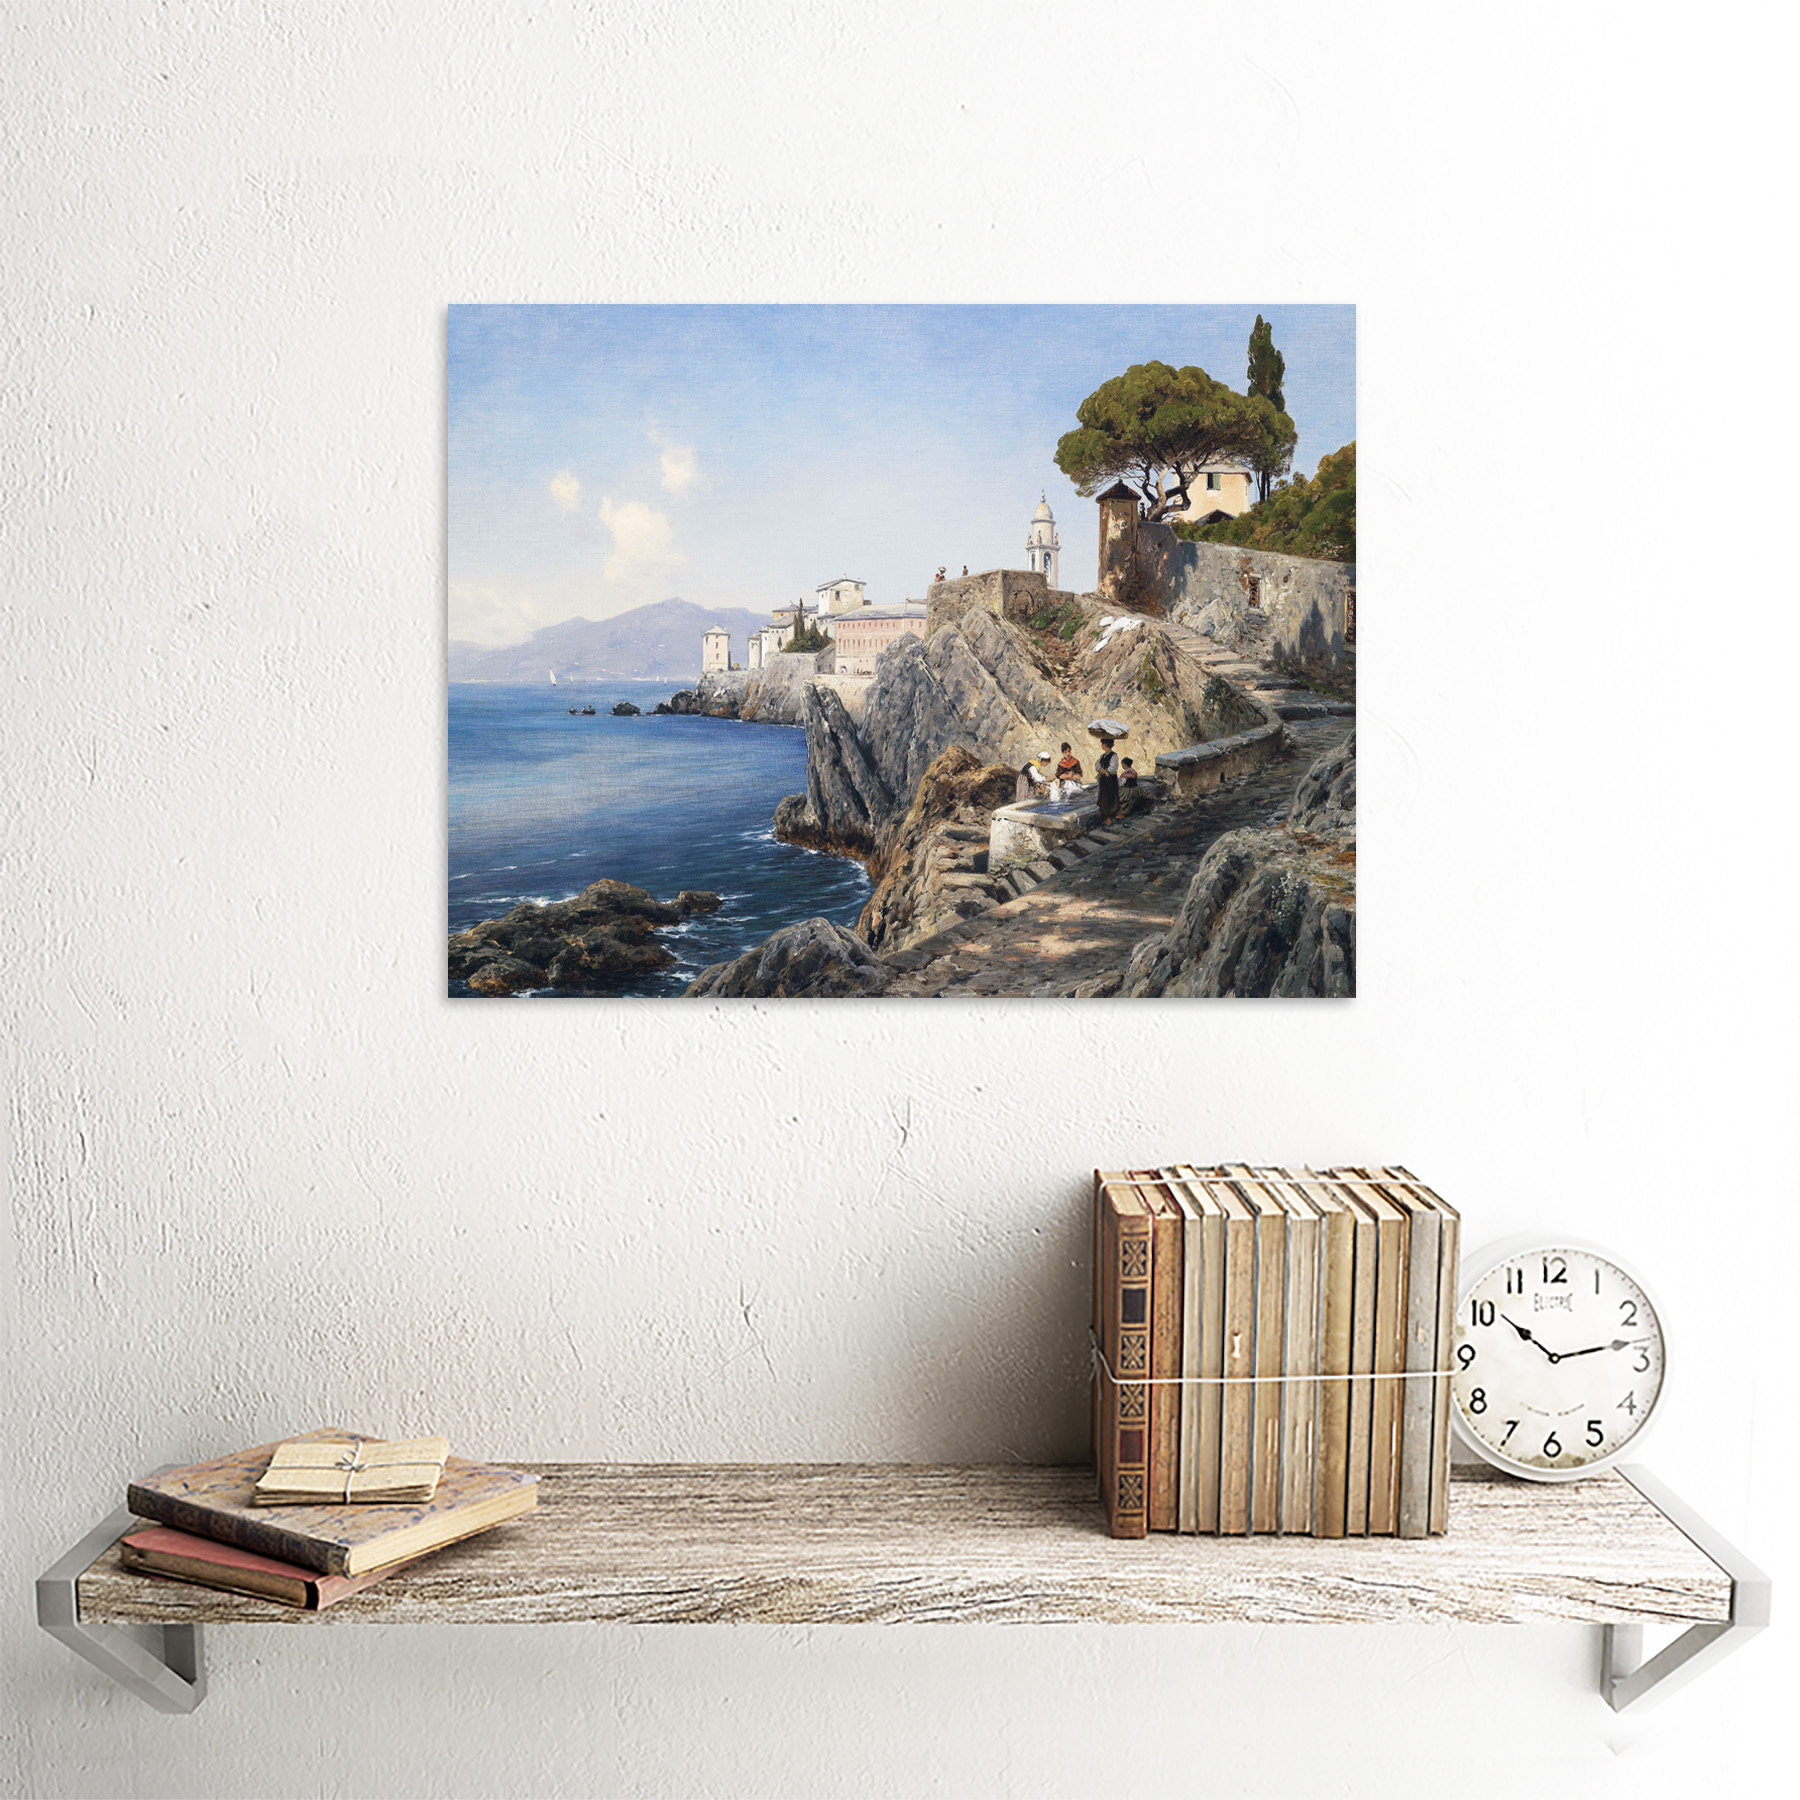 Lutteroth-Sturla-Shore-Genoa-Italy-Seascape-Painting-Art-Print-Framed-12x16 thumbnail 23